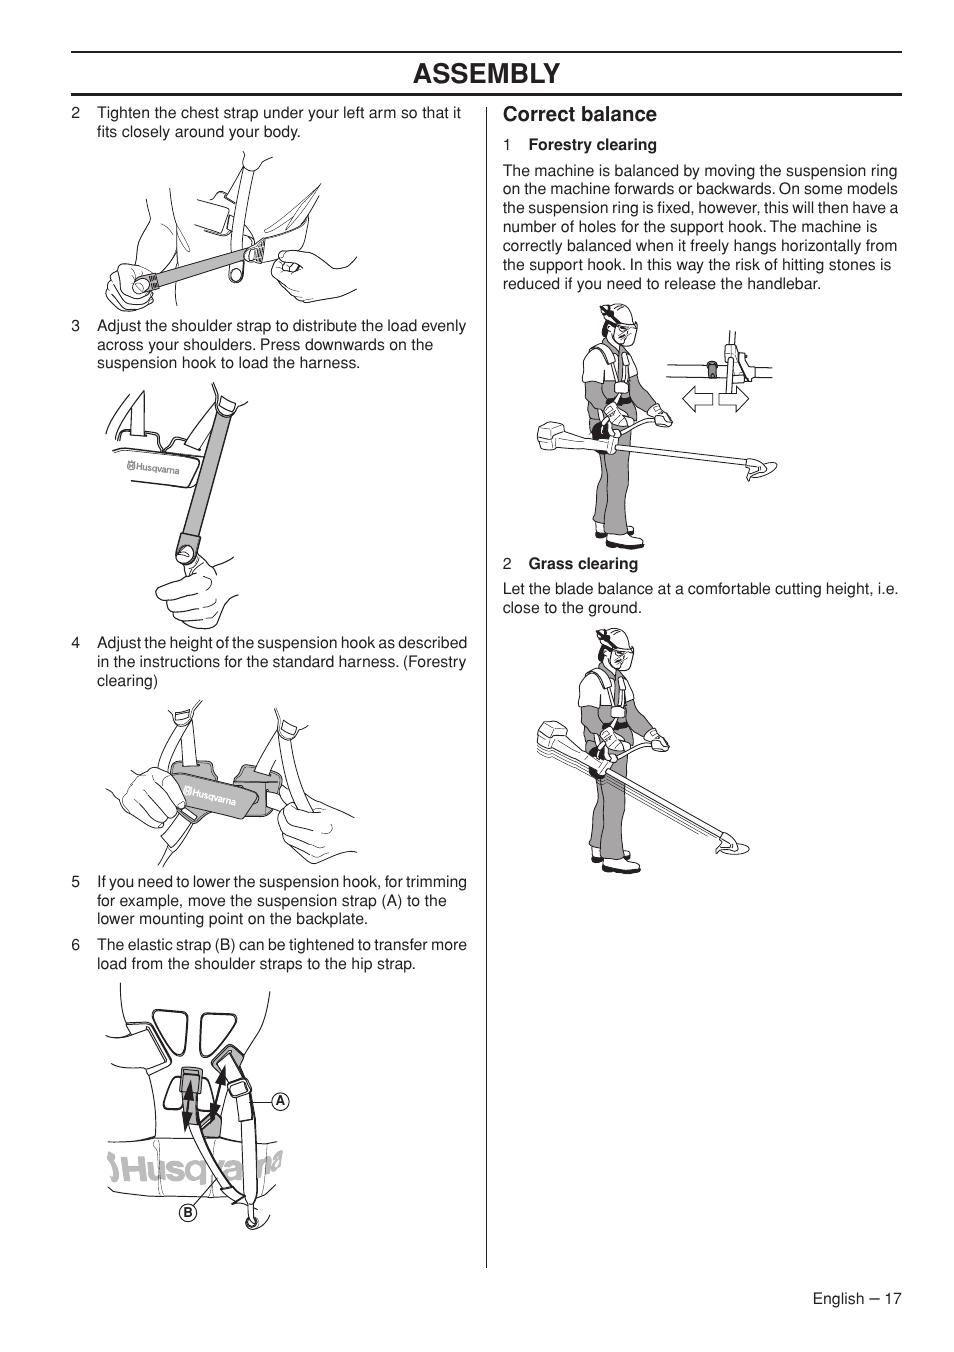 Correct balance, Assembly | Husqvarna 333R User Manual | Page 17 ...